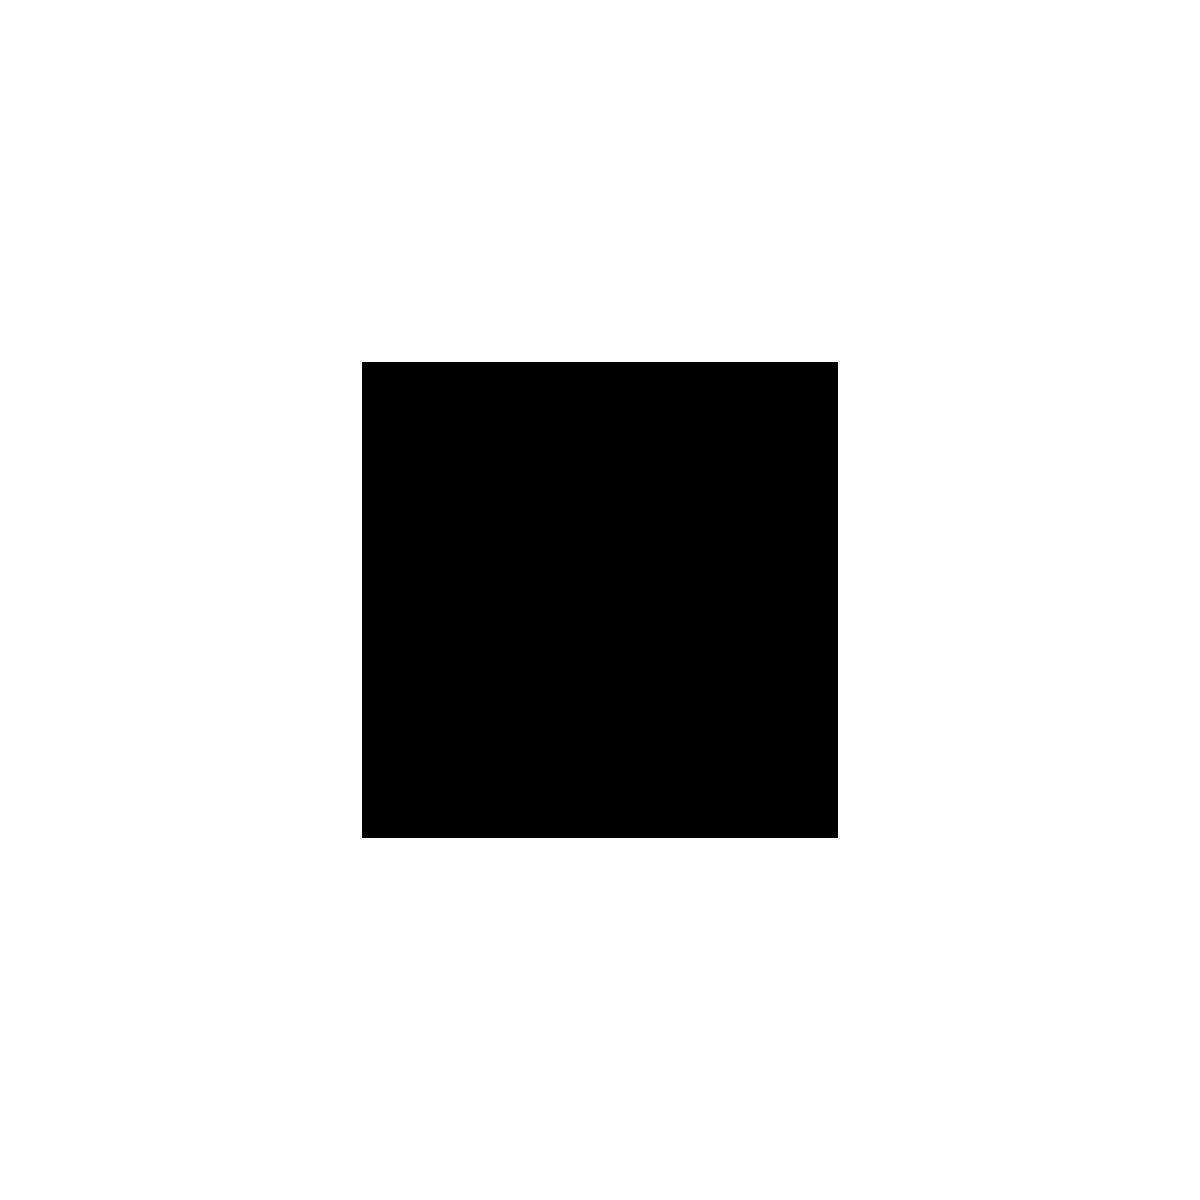 Deck_Patterns_1212.png